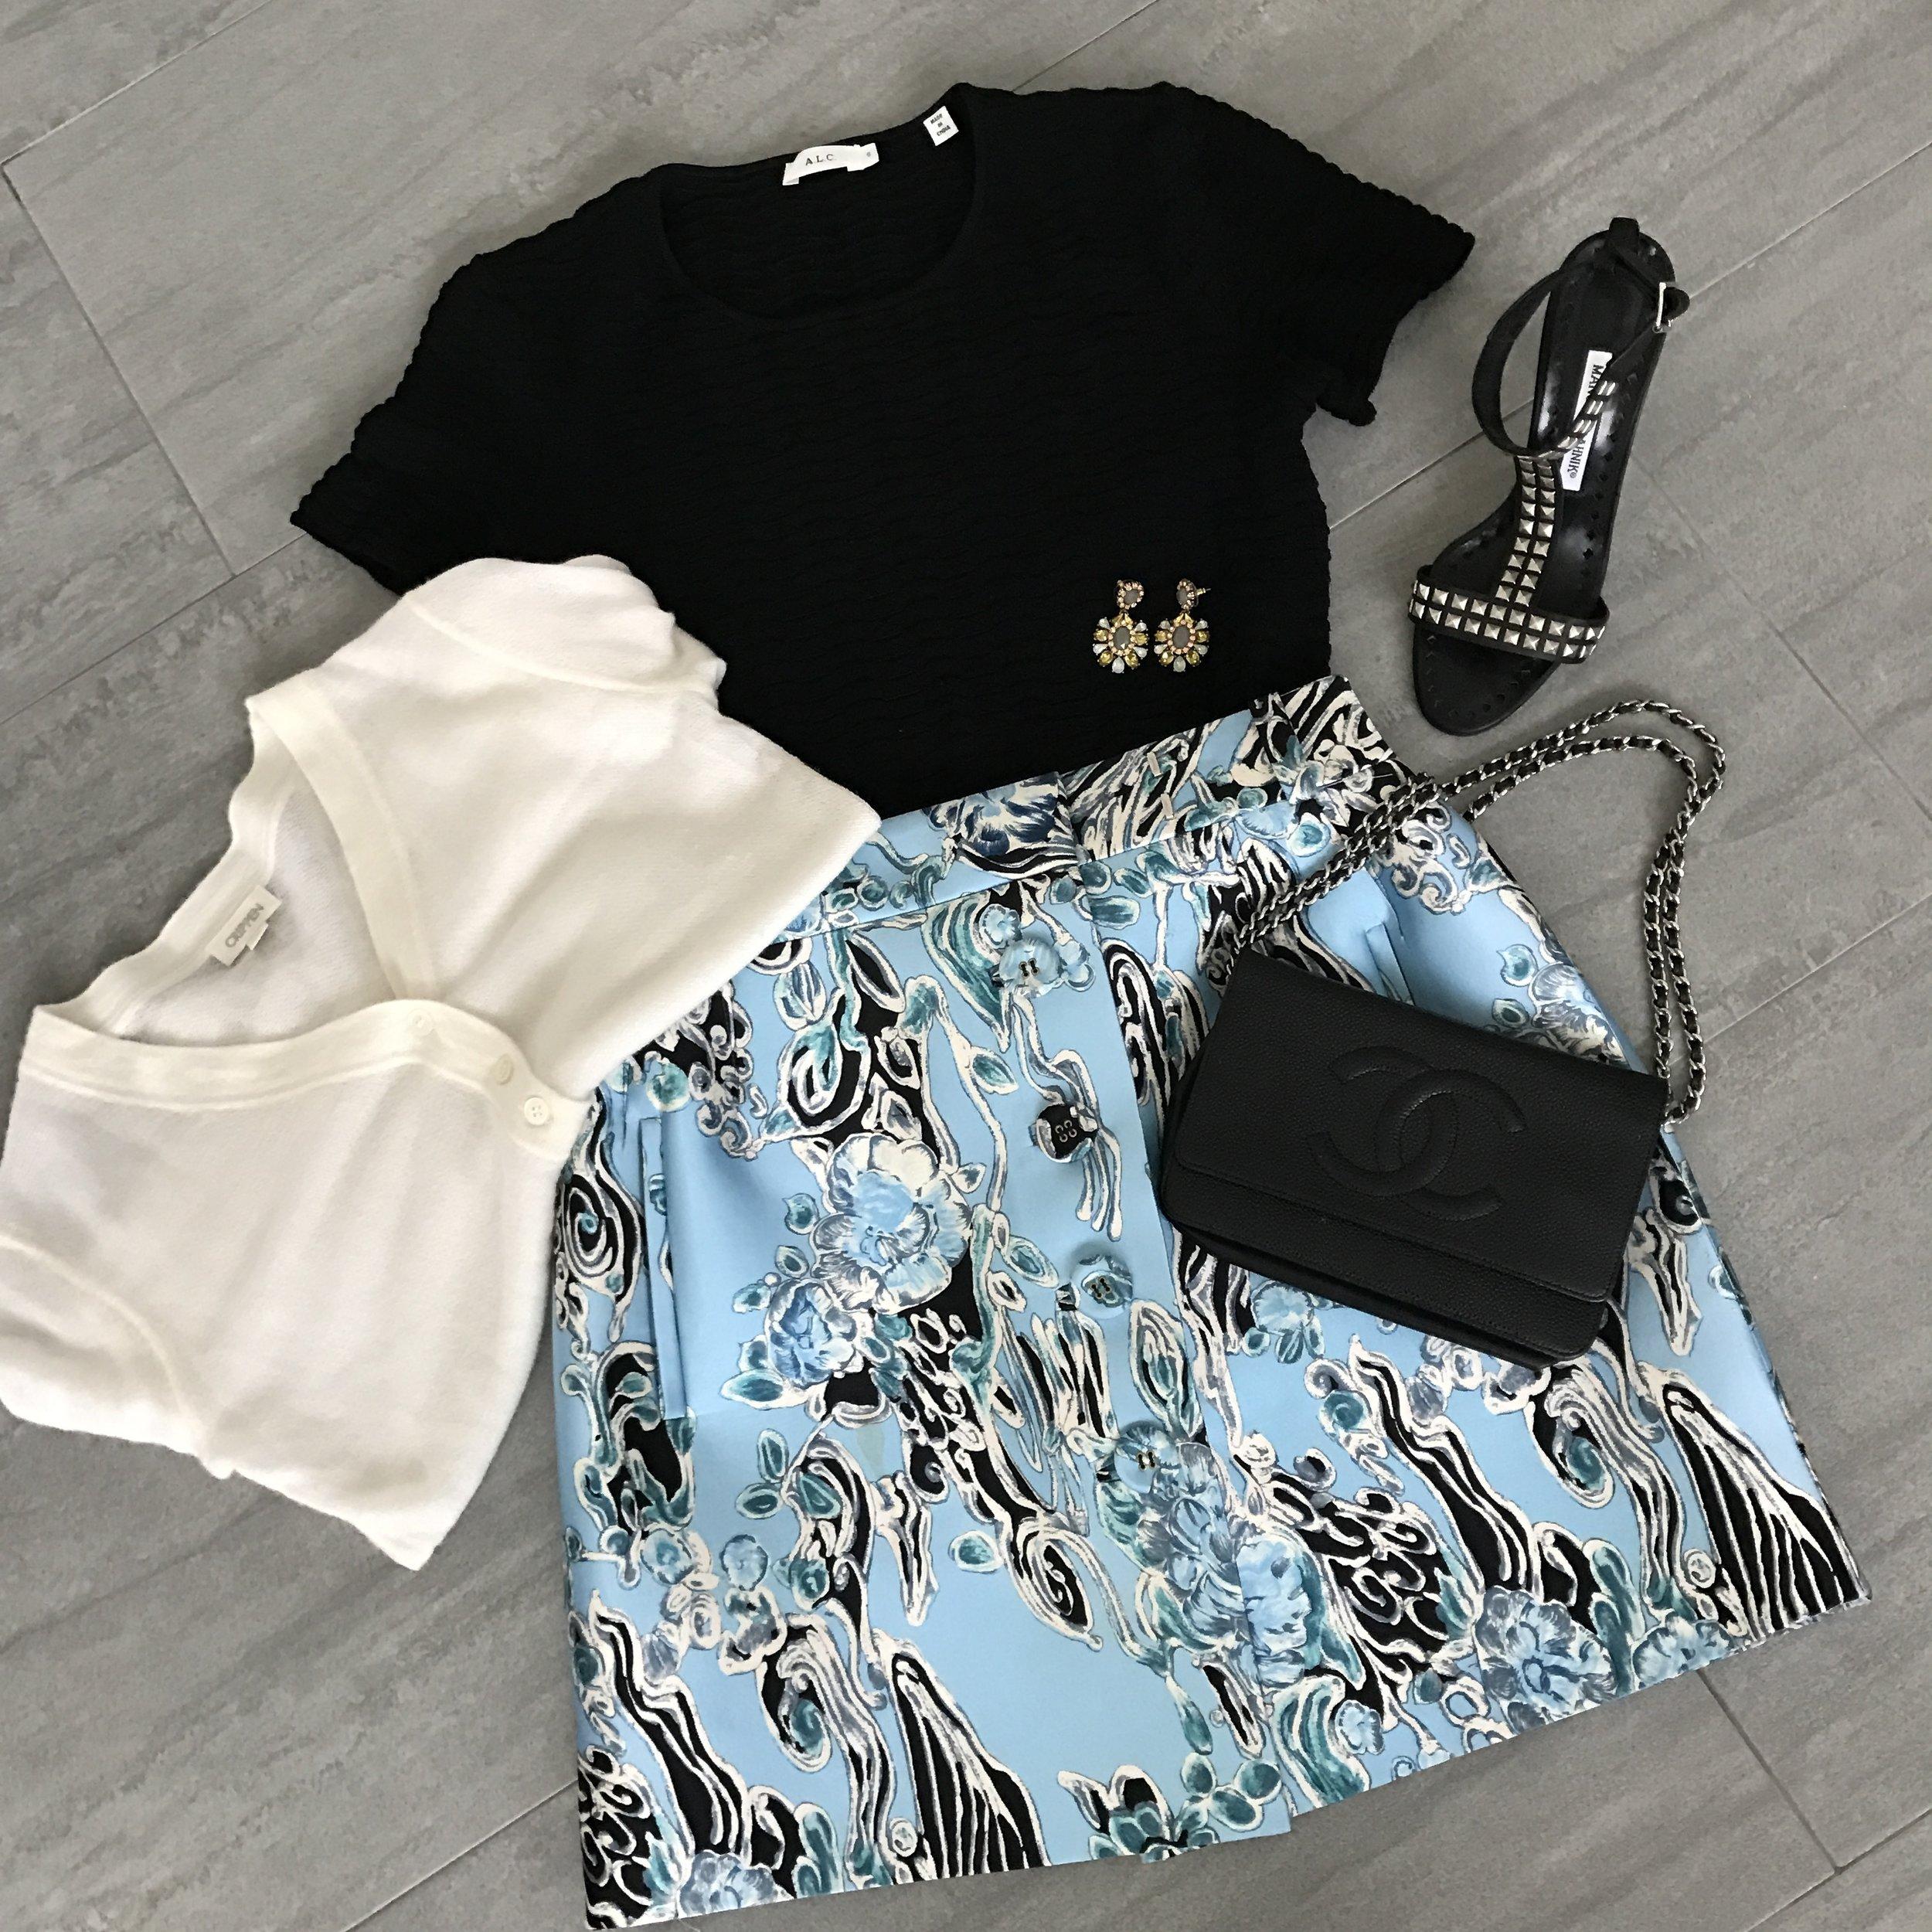 styled wardrobe stylist